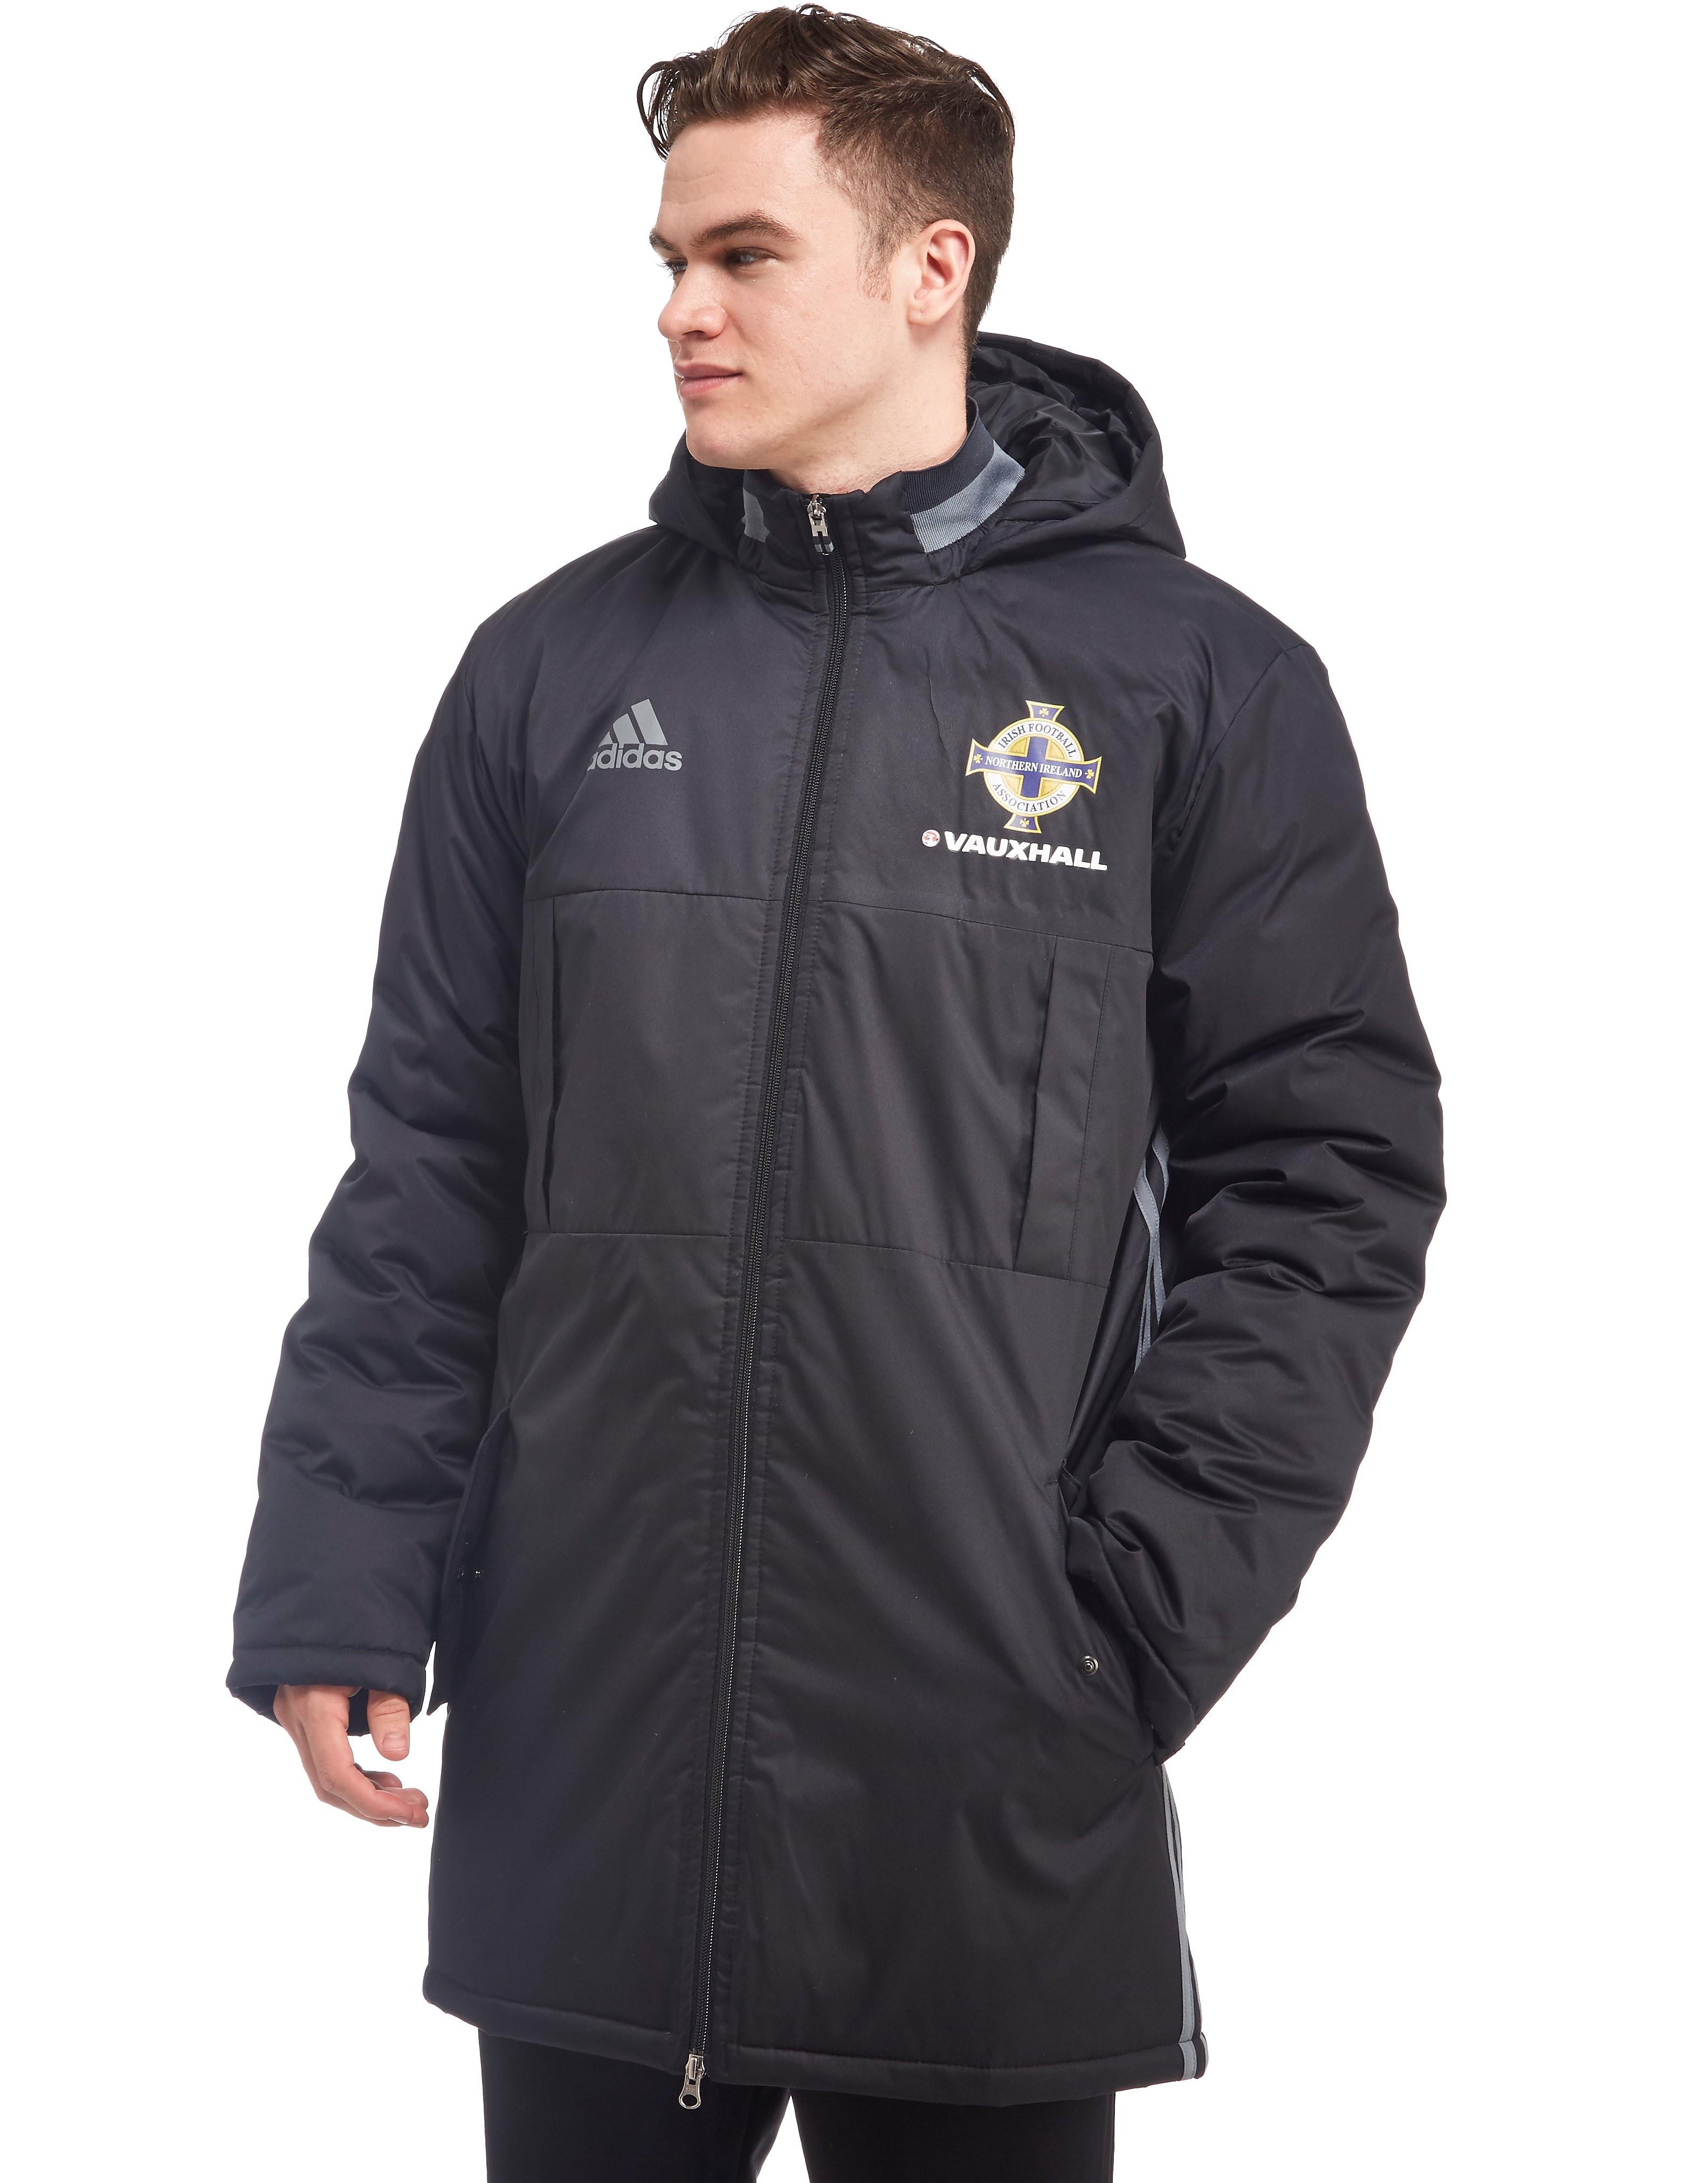 adidas Northern Ireland 2016/17 Stadium Jacket